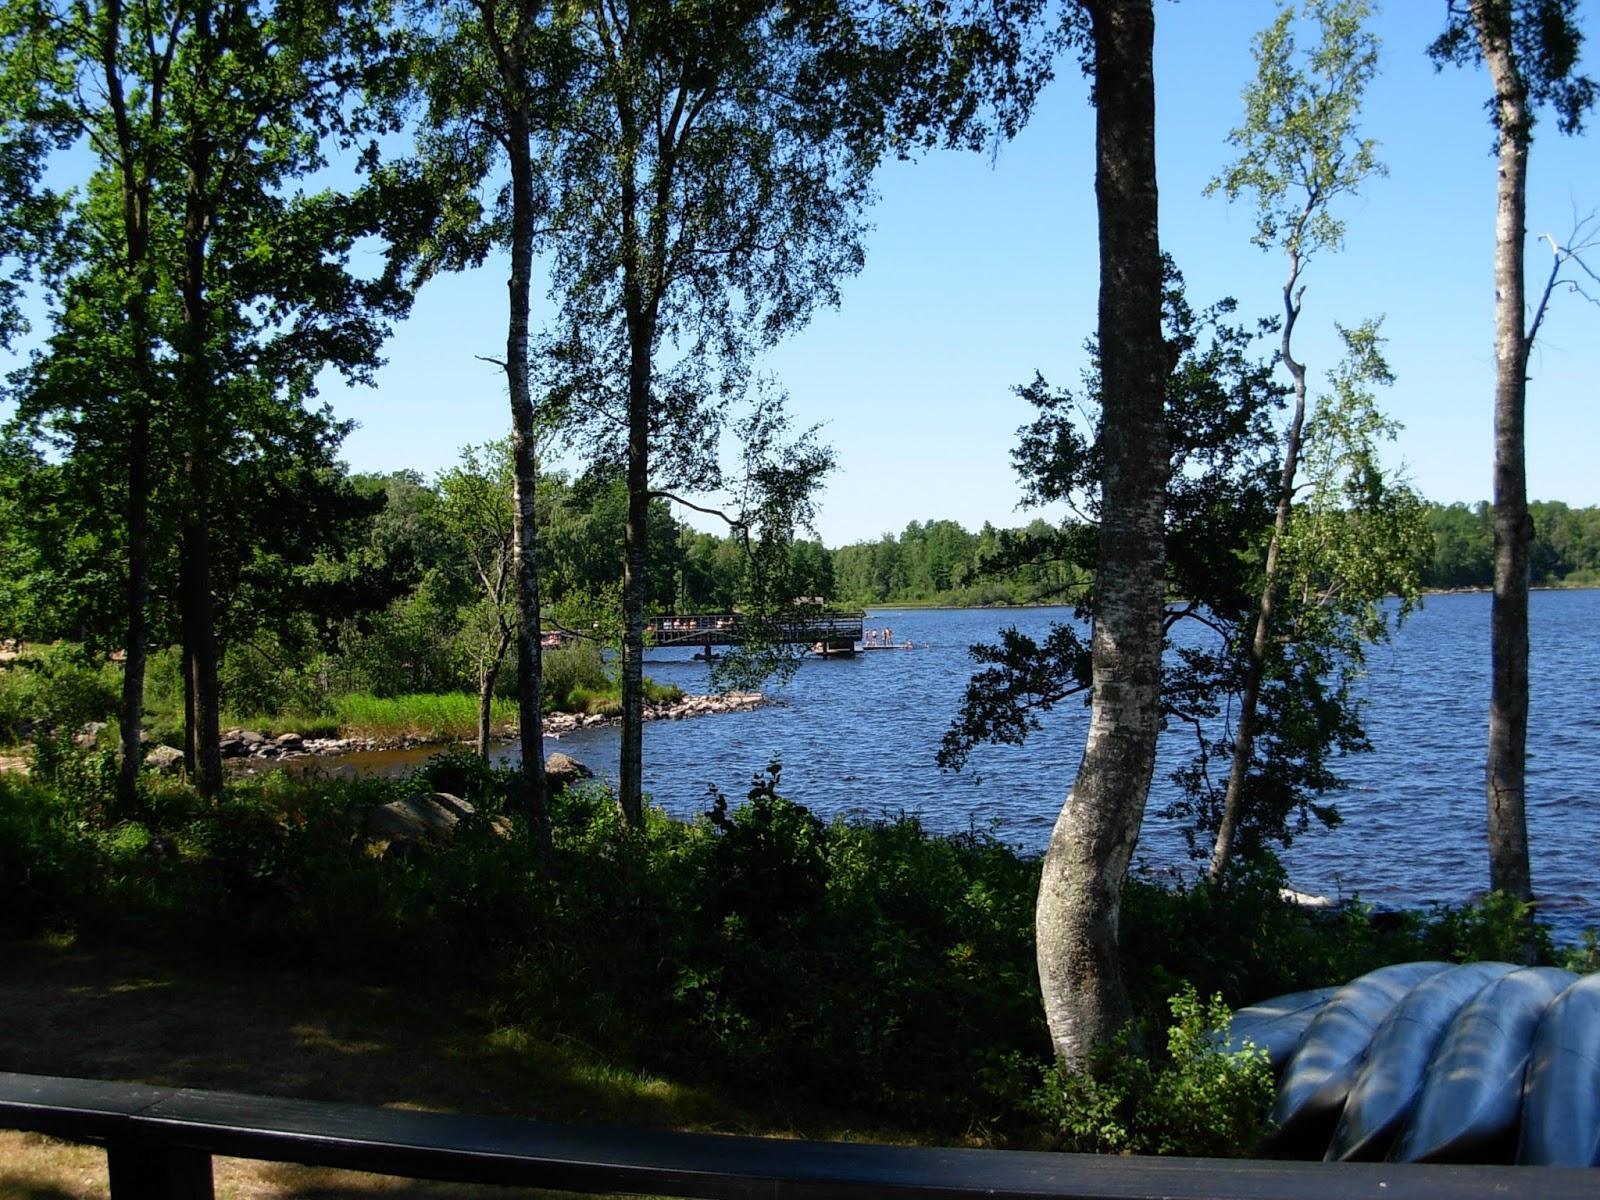 lmhult guys Sweden-almhult-ugadi celebrations 2018 men's remix sirens - duration: 7:28 grandhi vijay kumar 190 views 7:28 framtida stadsgården.